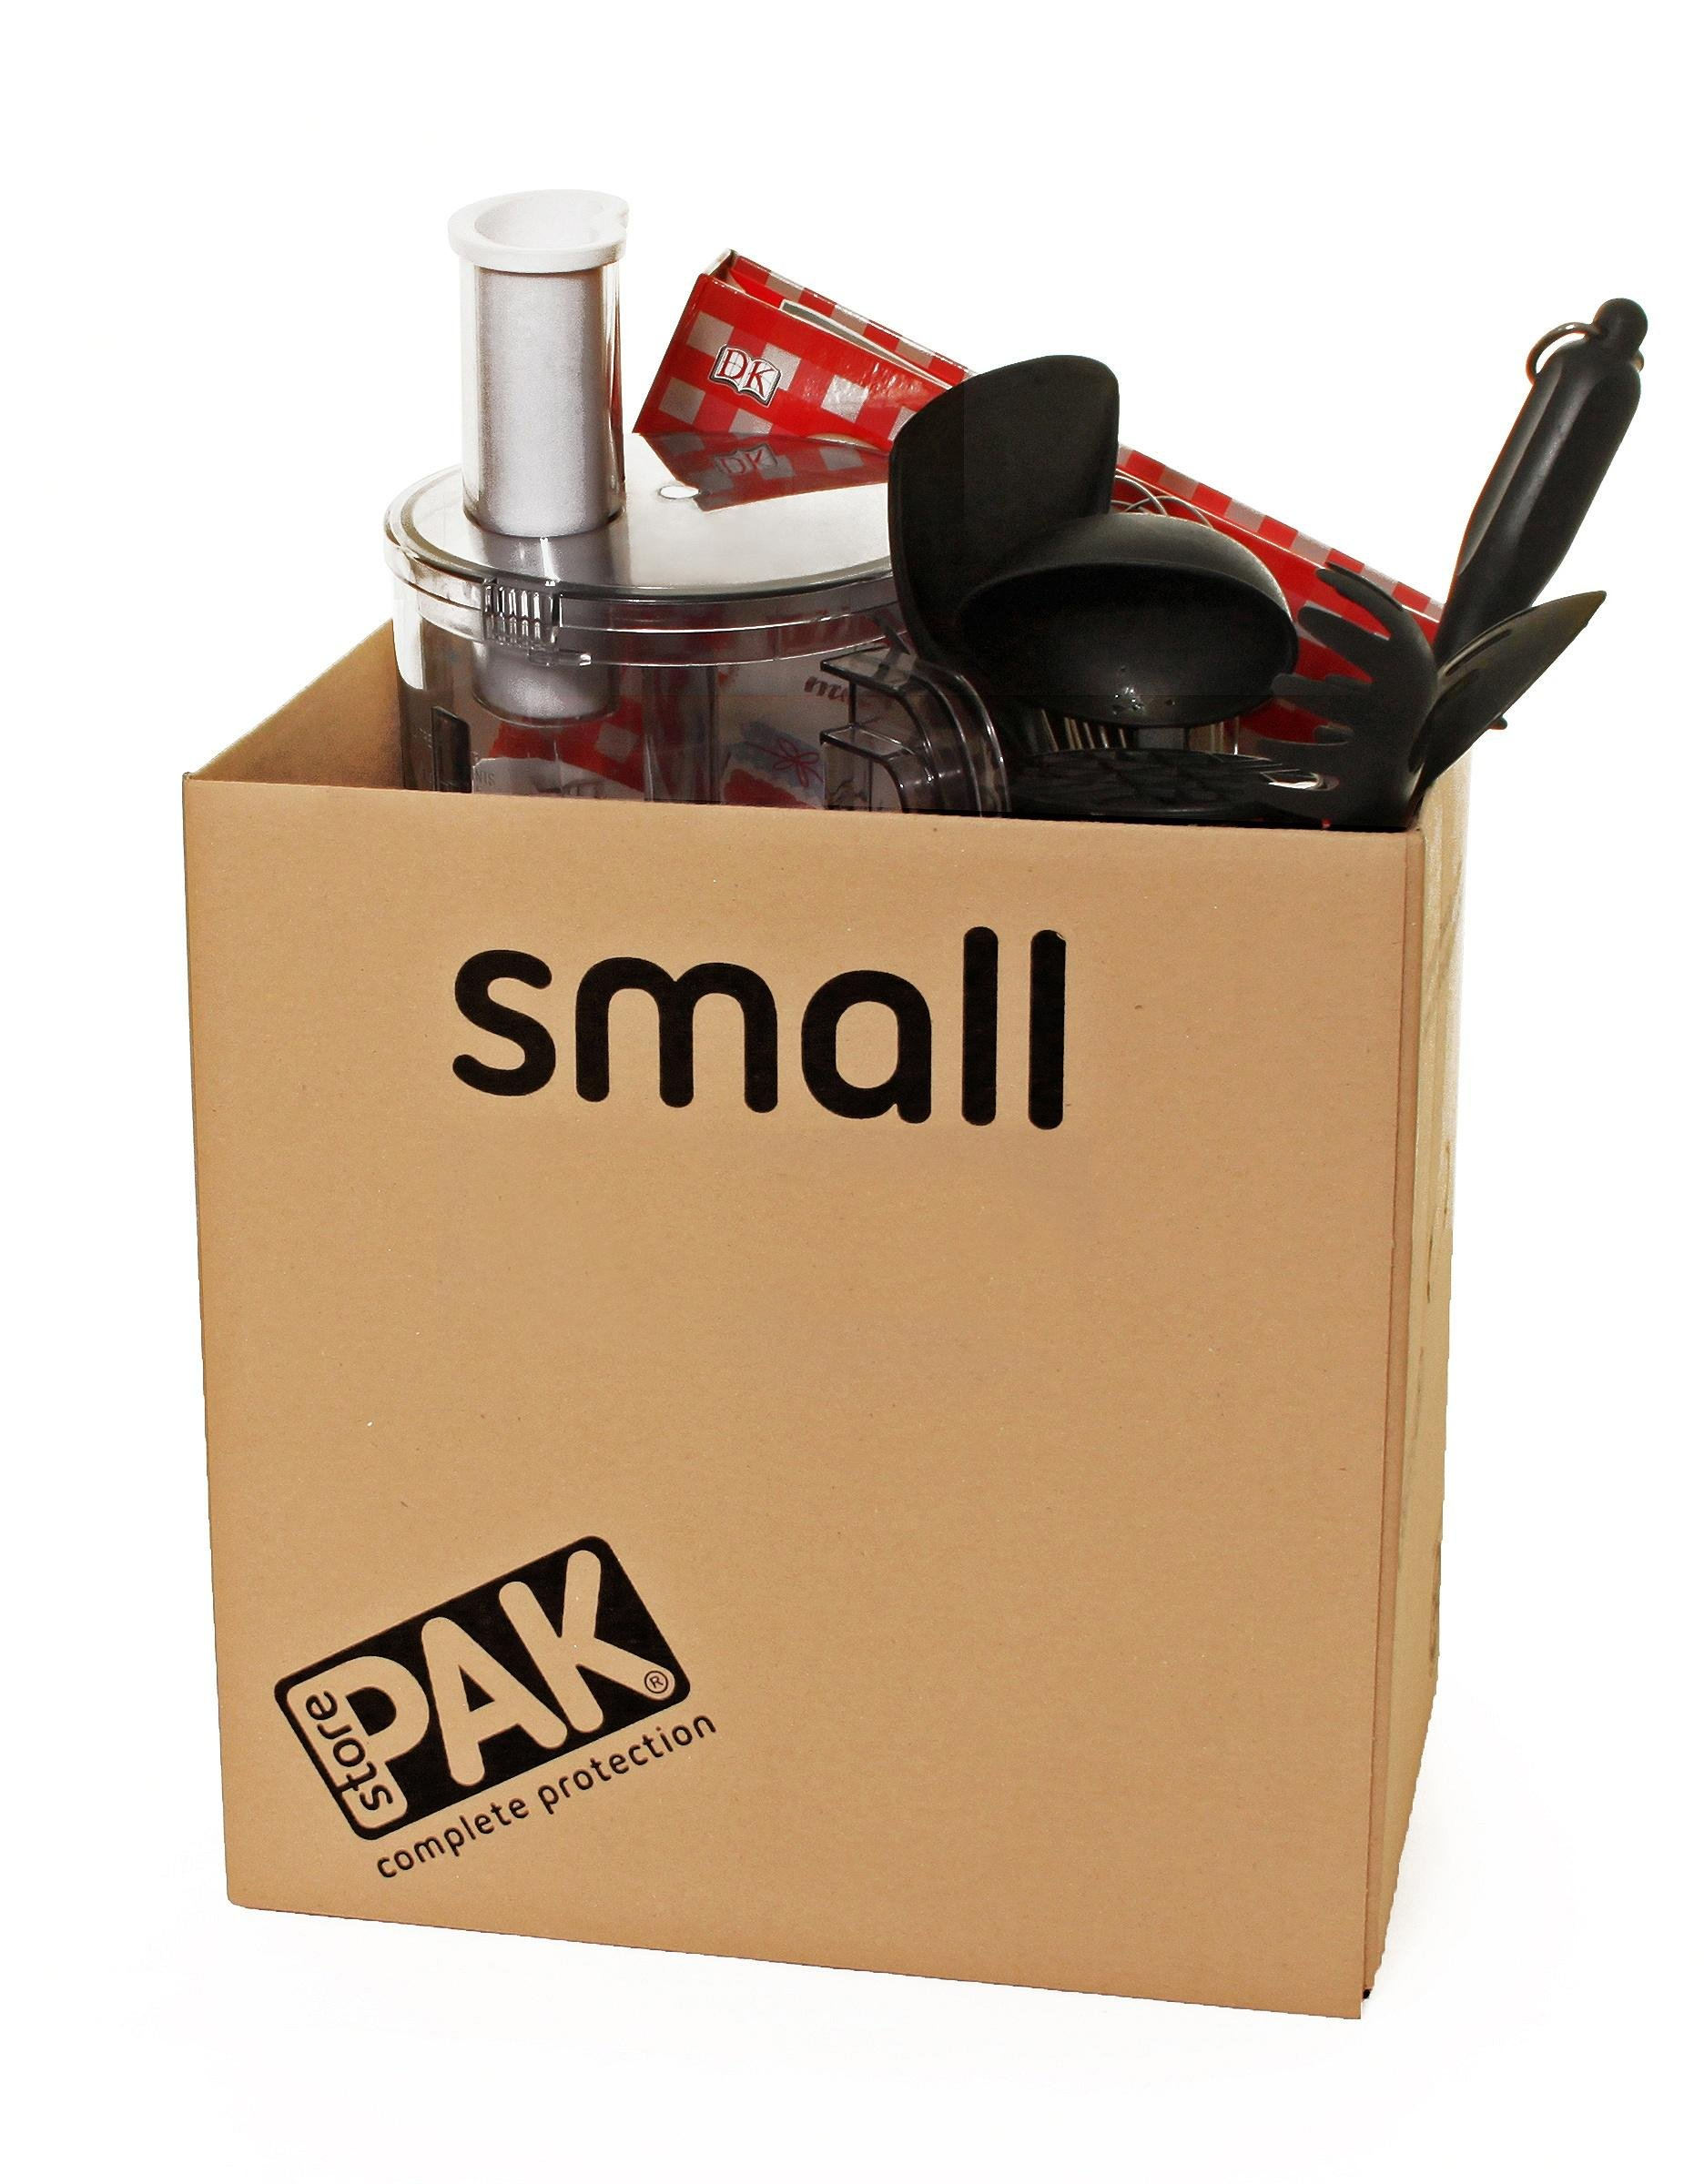 StorePAK Small Cardboard Boxes - Set of 10